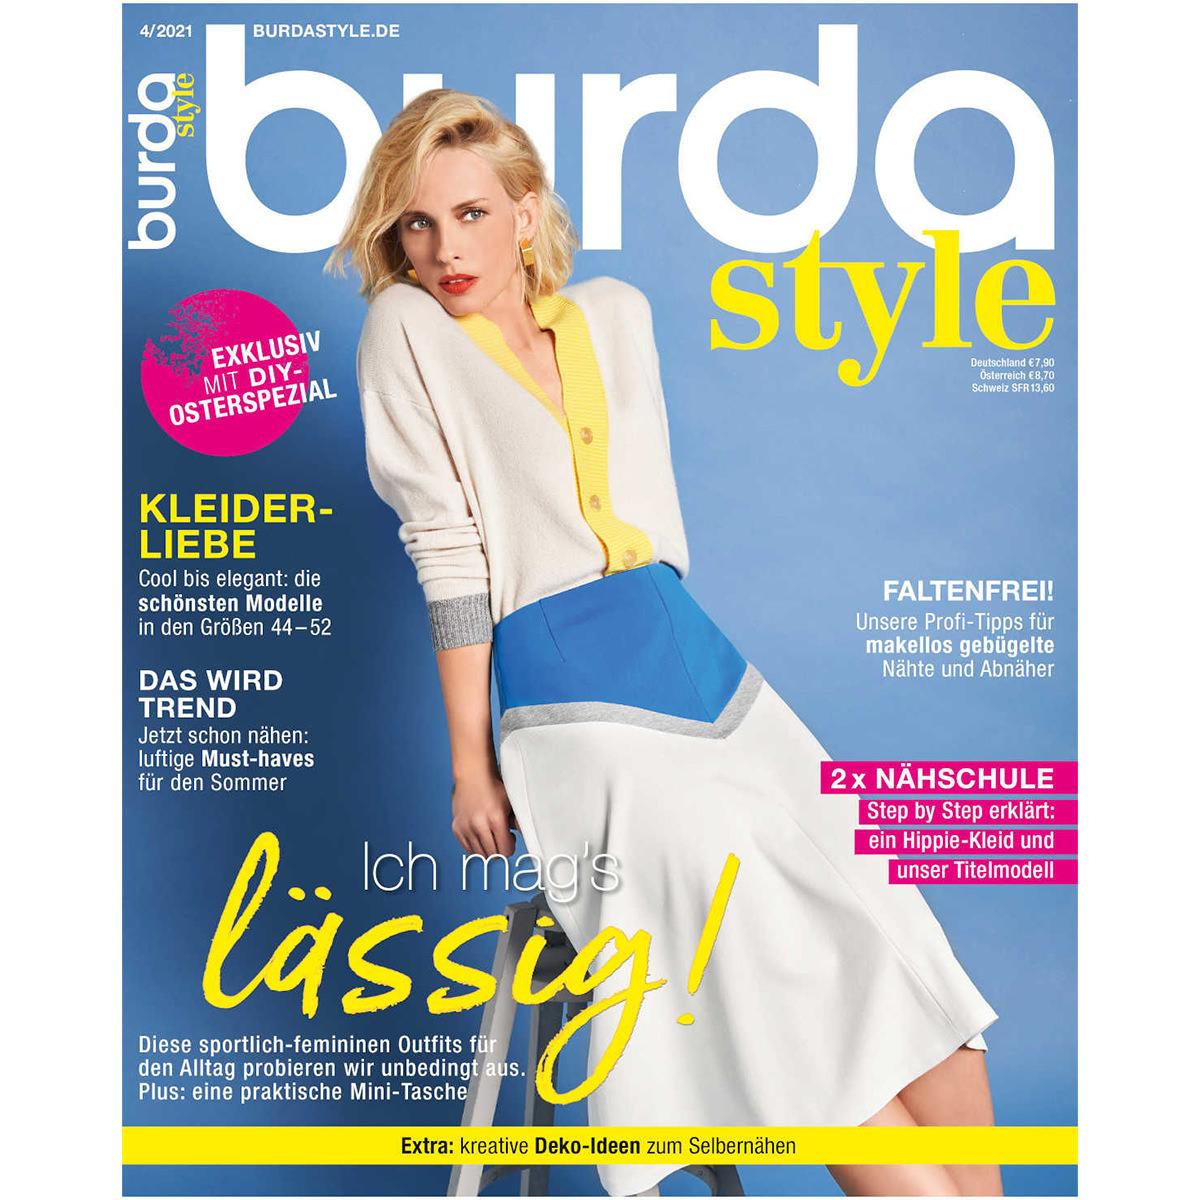 burda style Ausgabe April 2021